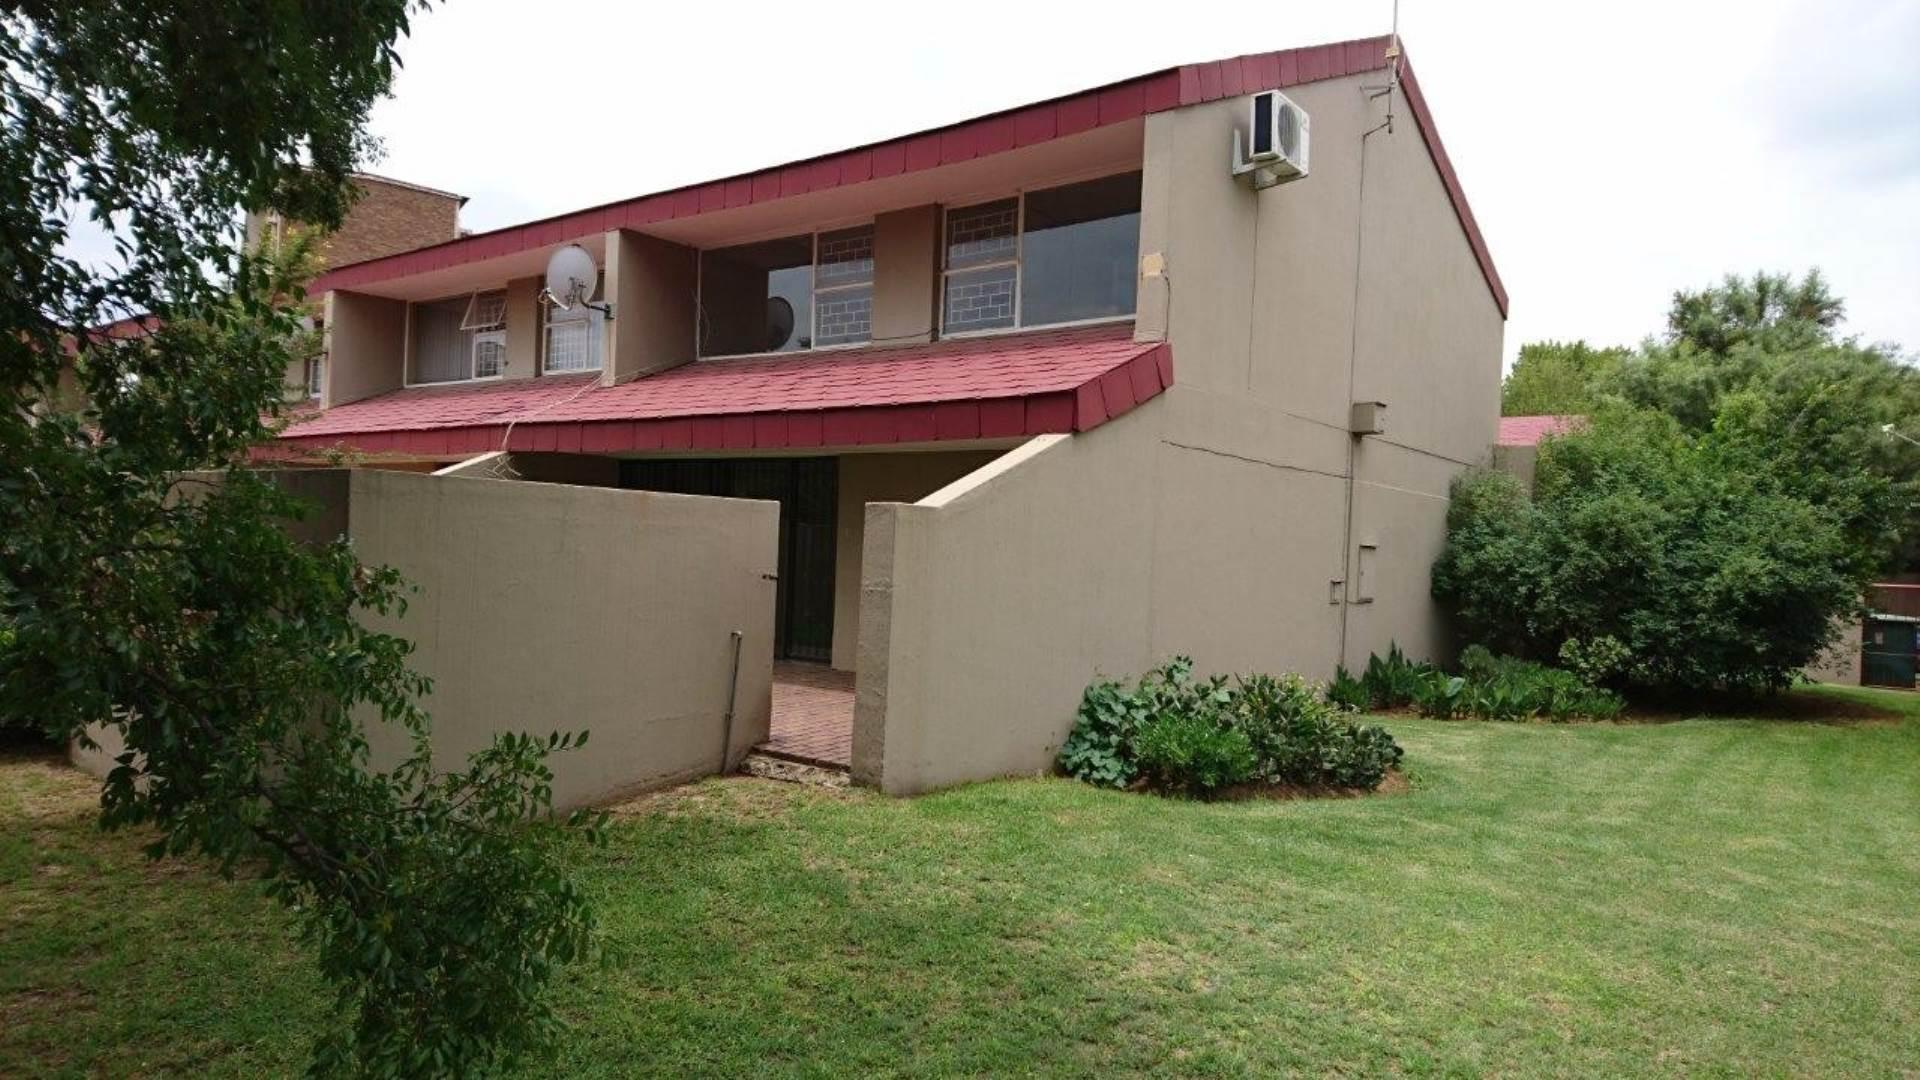 3 BedroomTownhouse For Sale In Sasolburg